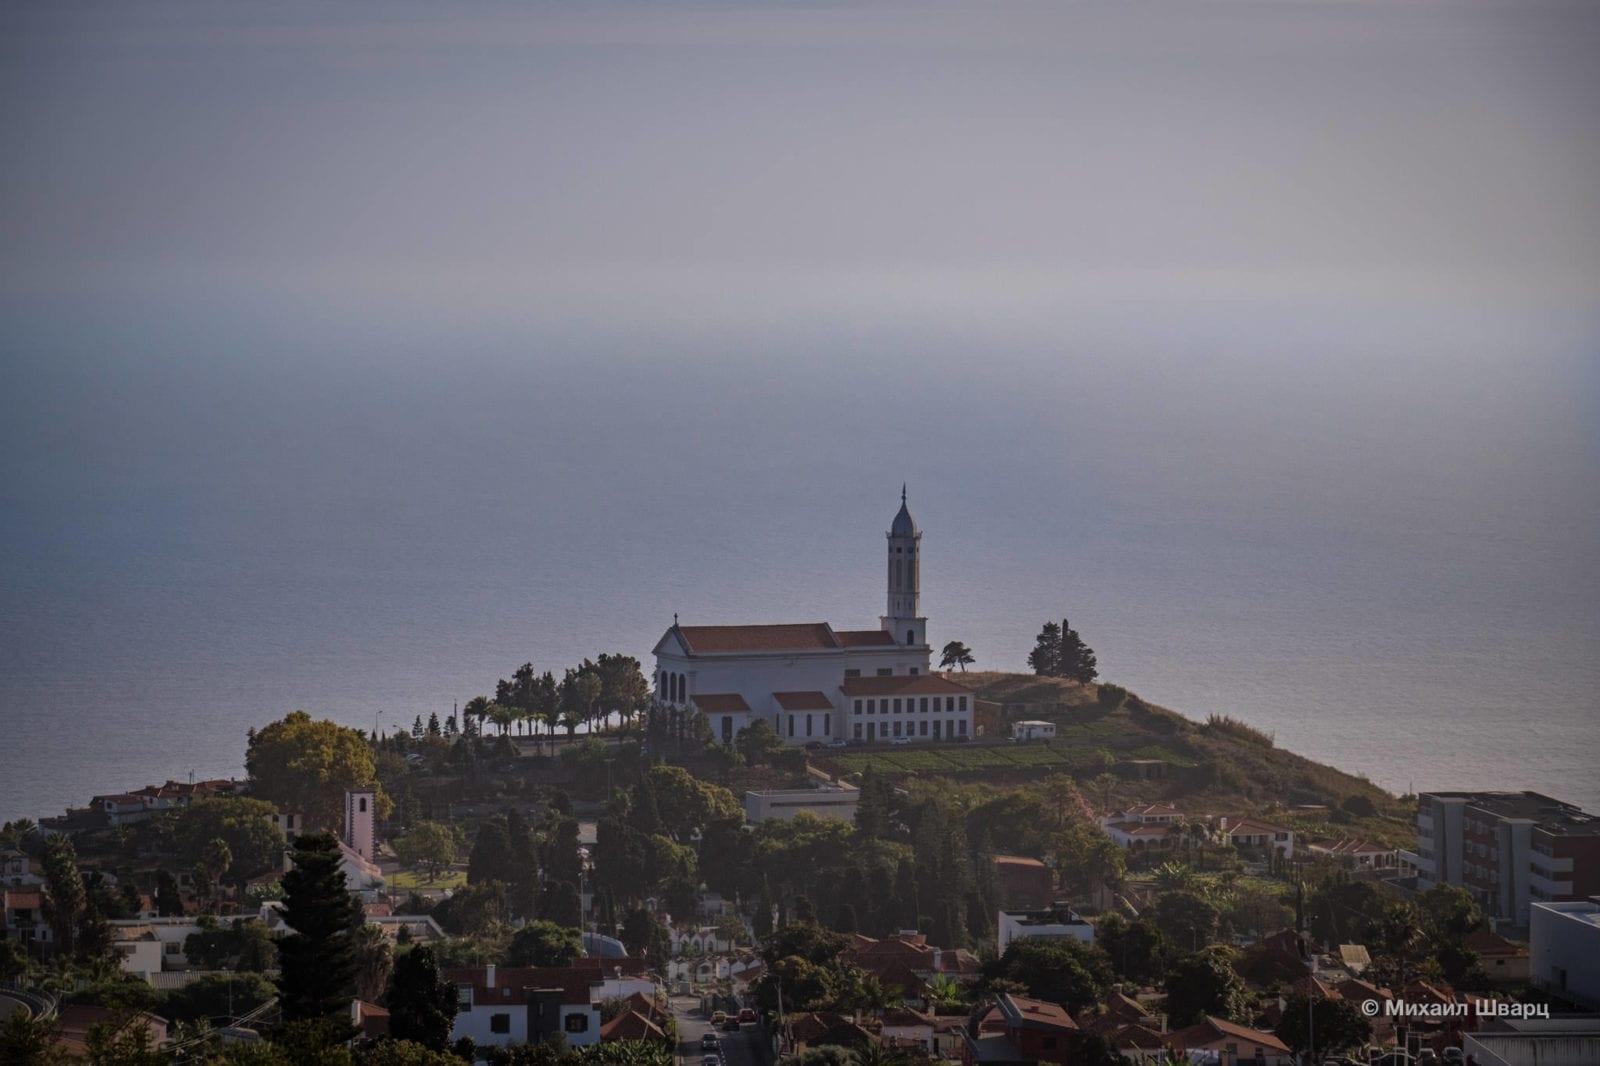 Вид на Церковь Святого Мартина (Igreja de São Martinho)